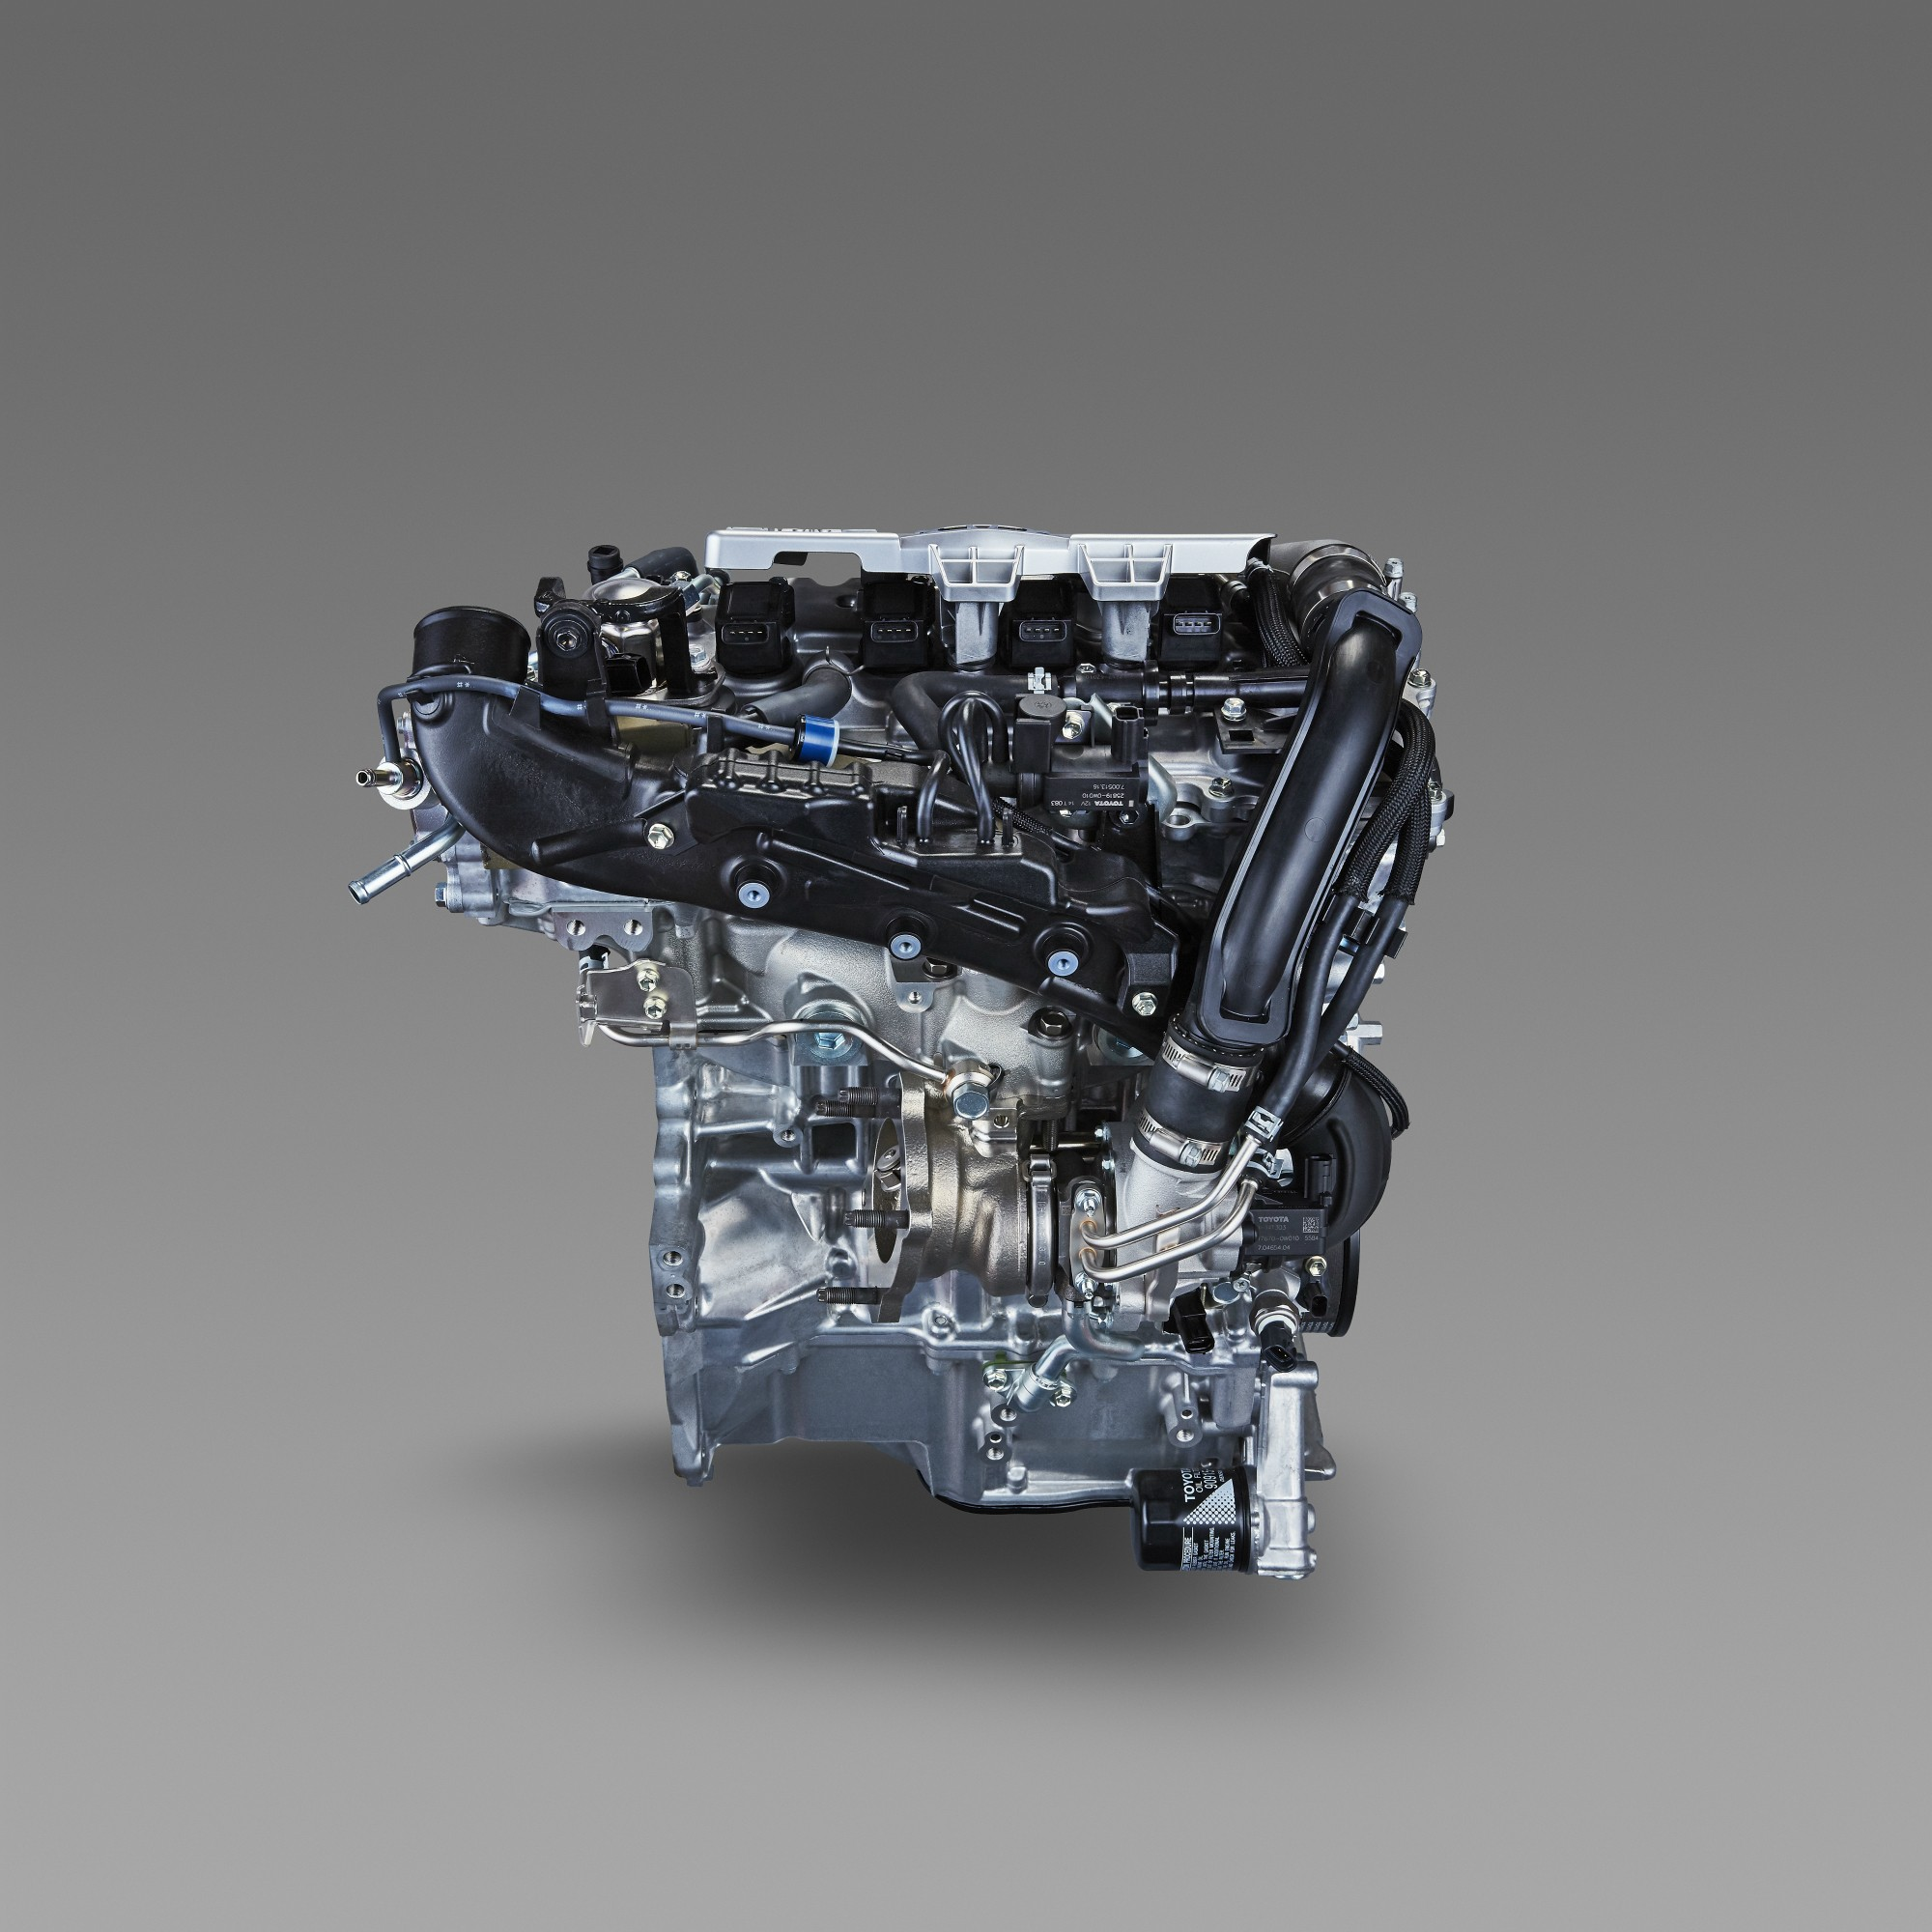 Toyota 8nr Fts 1 2l Turbo Engine Detailed Autoevolution